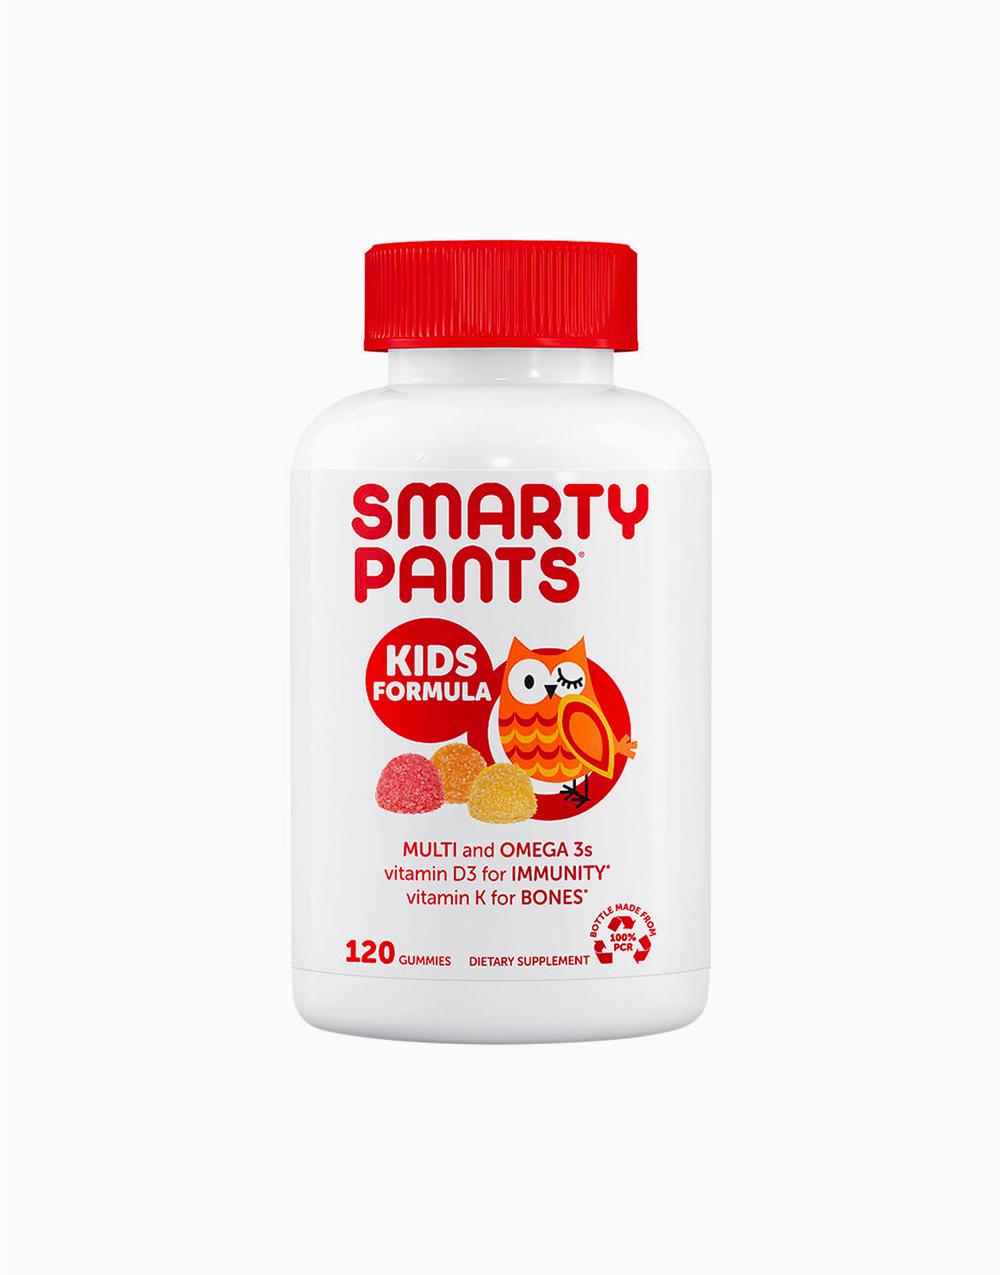 Kids Formula Multi and Omega 3s Vitamin D3 for Immunity Vitamin K for Bones (120 Gummies)  by Smarty Pants